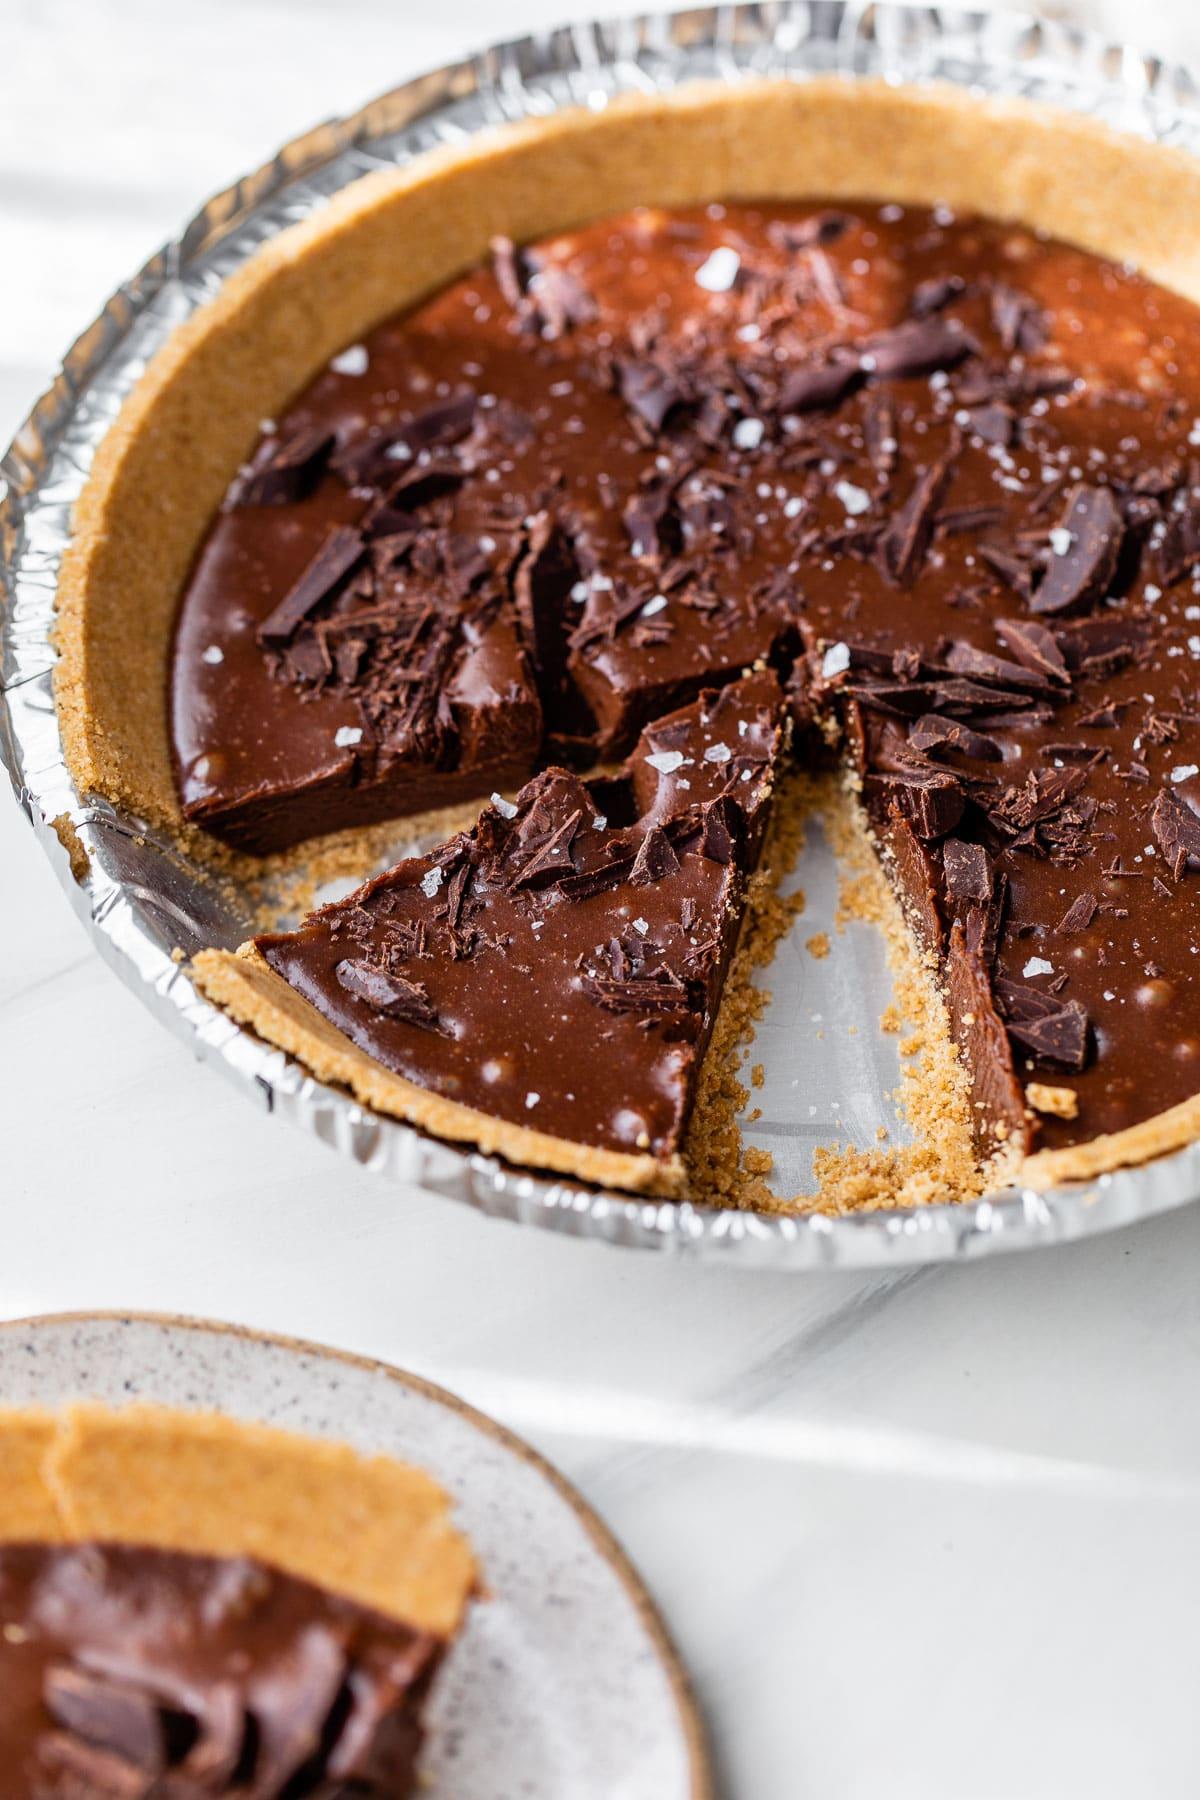 chocolate pie in an aluminum pie pan